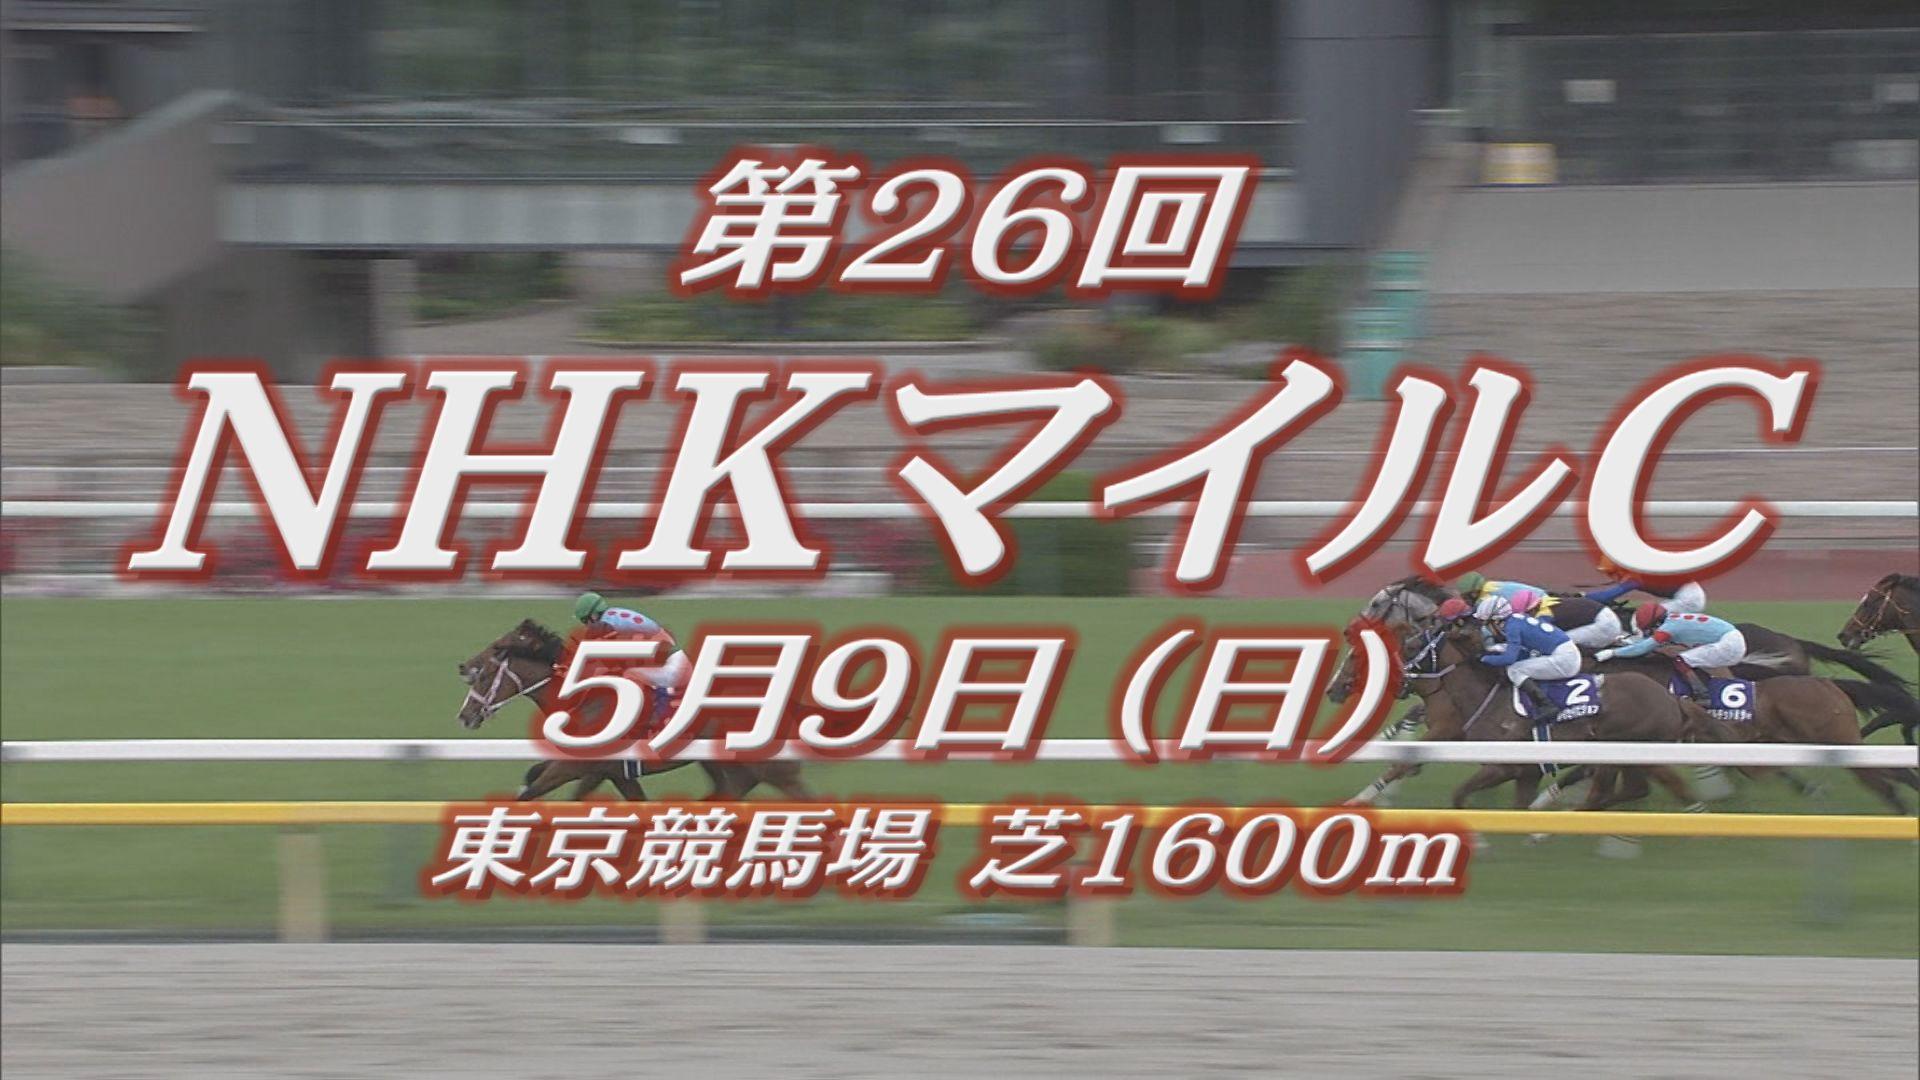 【GIレース出走予定馬紹介】NHKマイルカップ 5/9 東京競馬場